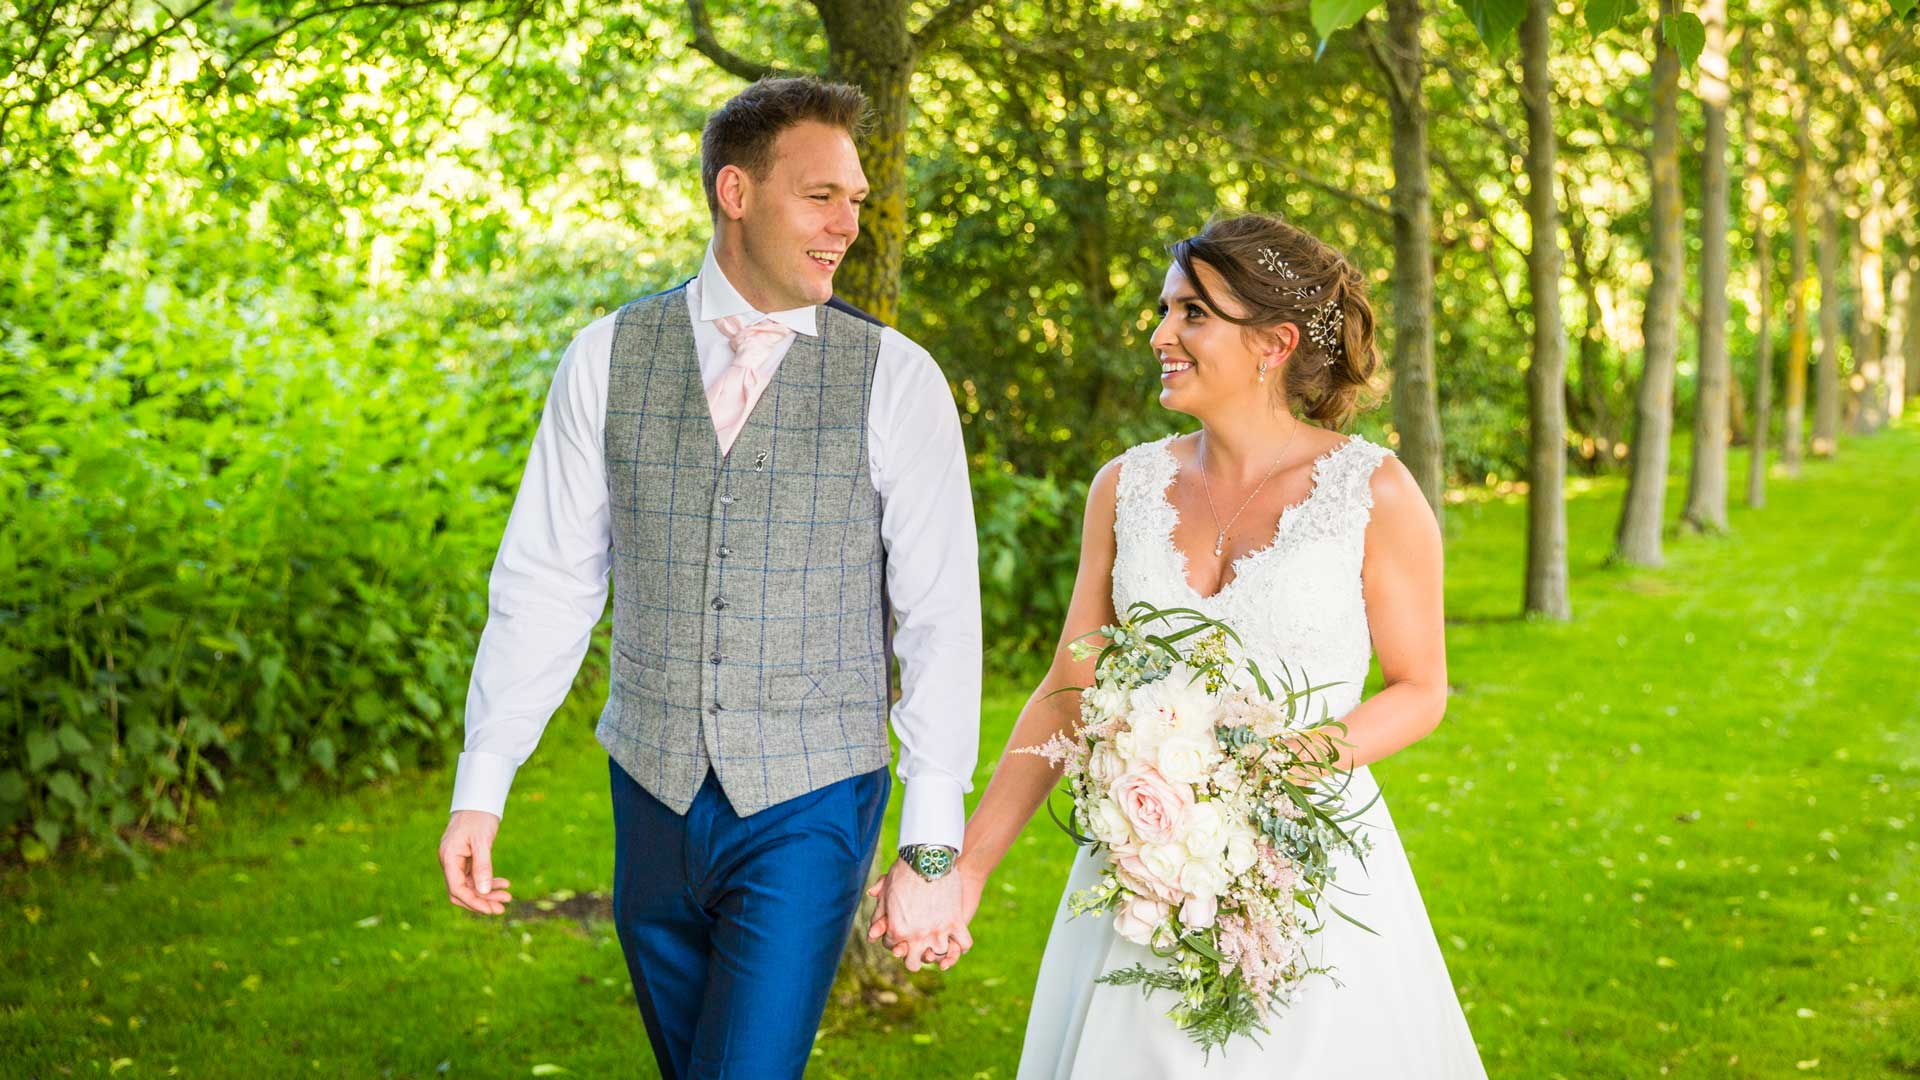 Wedding photograph by Martin Hemsley, wedding photographer